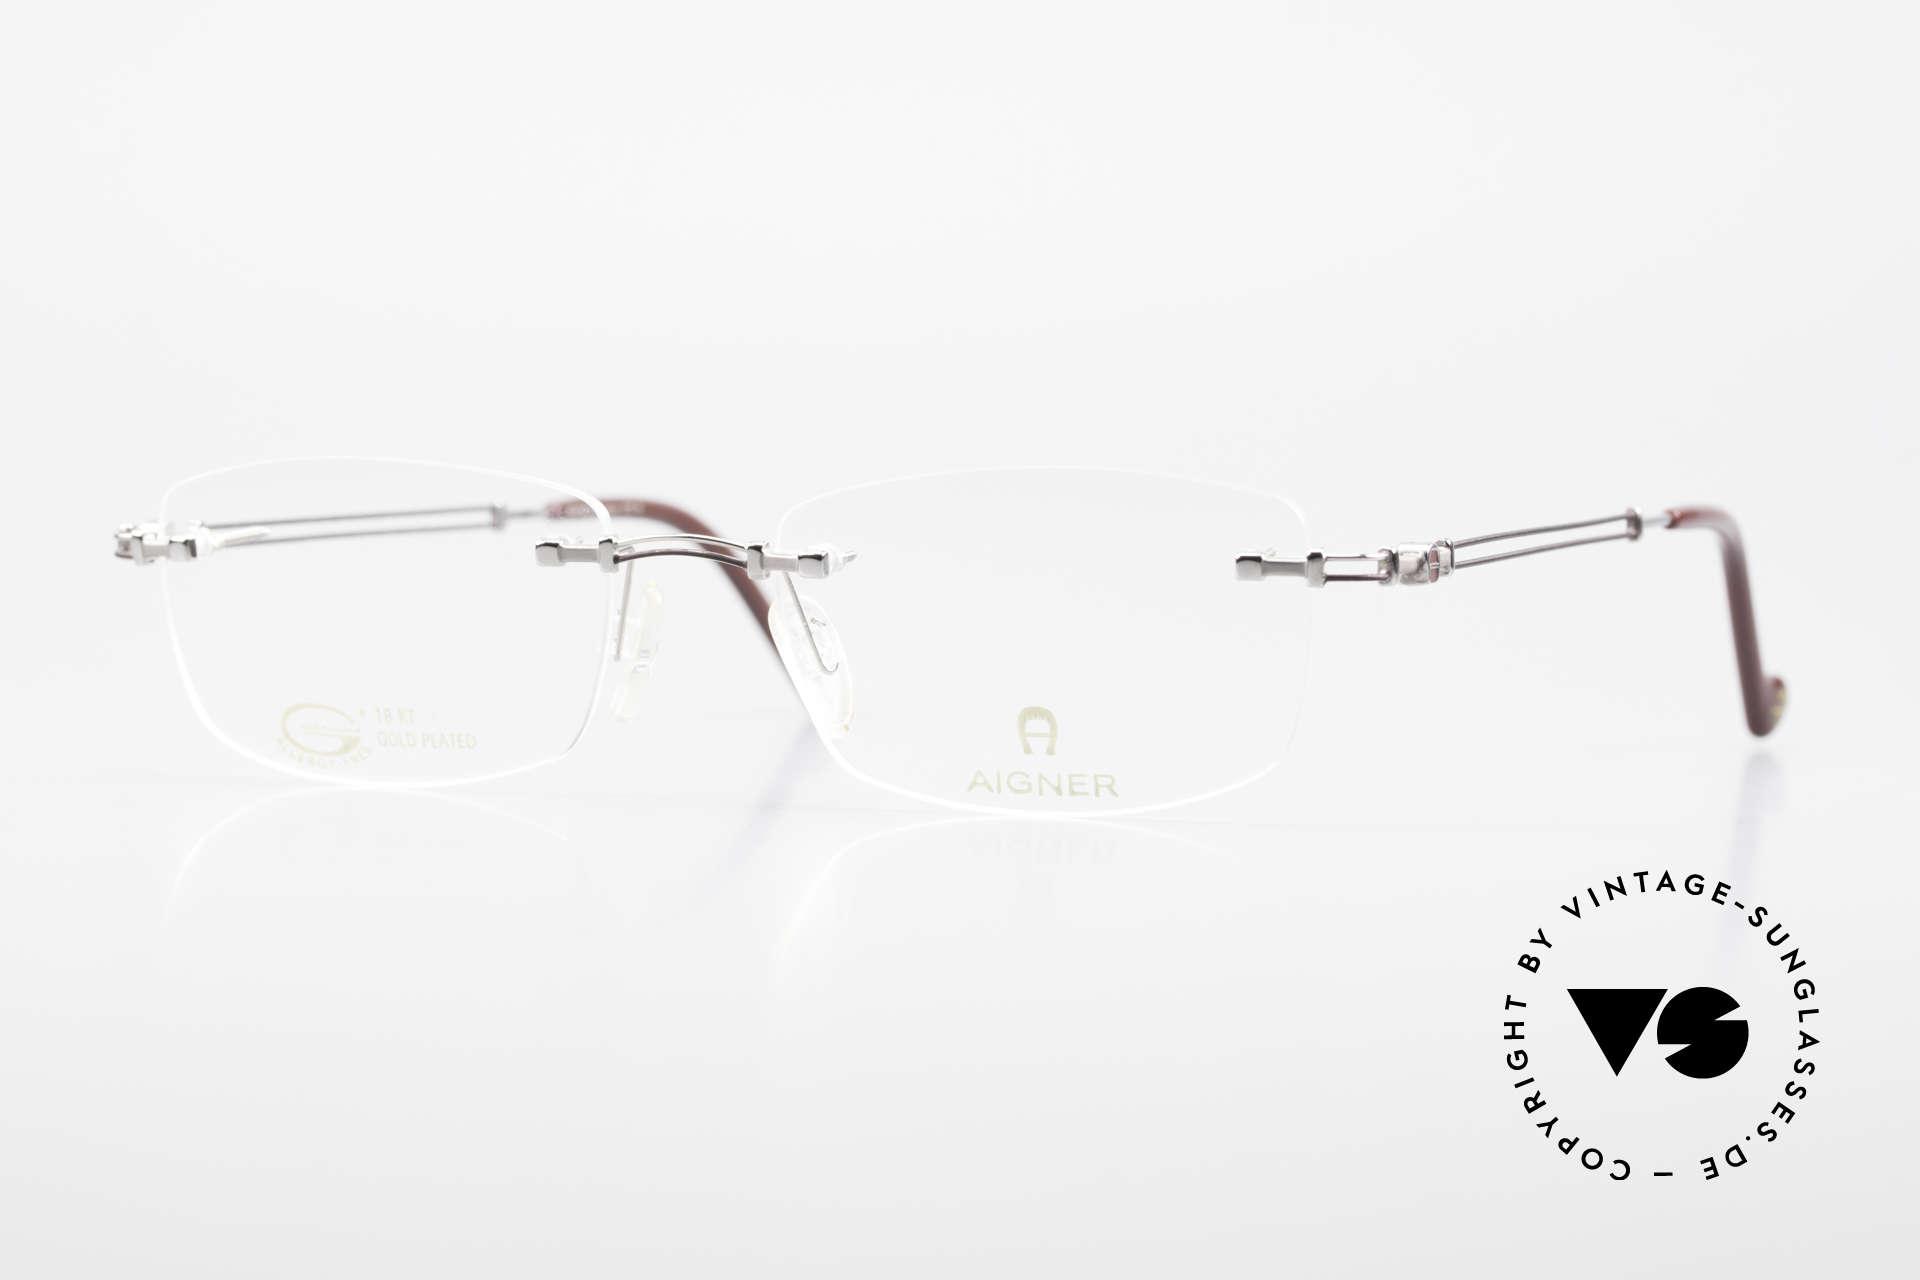 Aigner EA498 Rimless Vintage Glasses 90's, rimless AIGNER vintage glasses, EA498, size 53/18, 140, Made for Men and Women